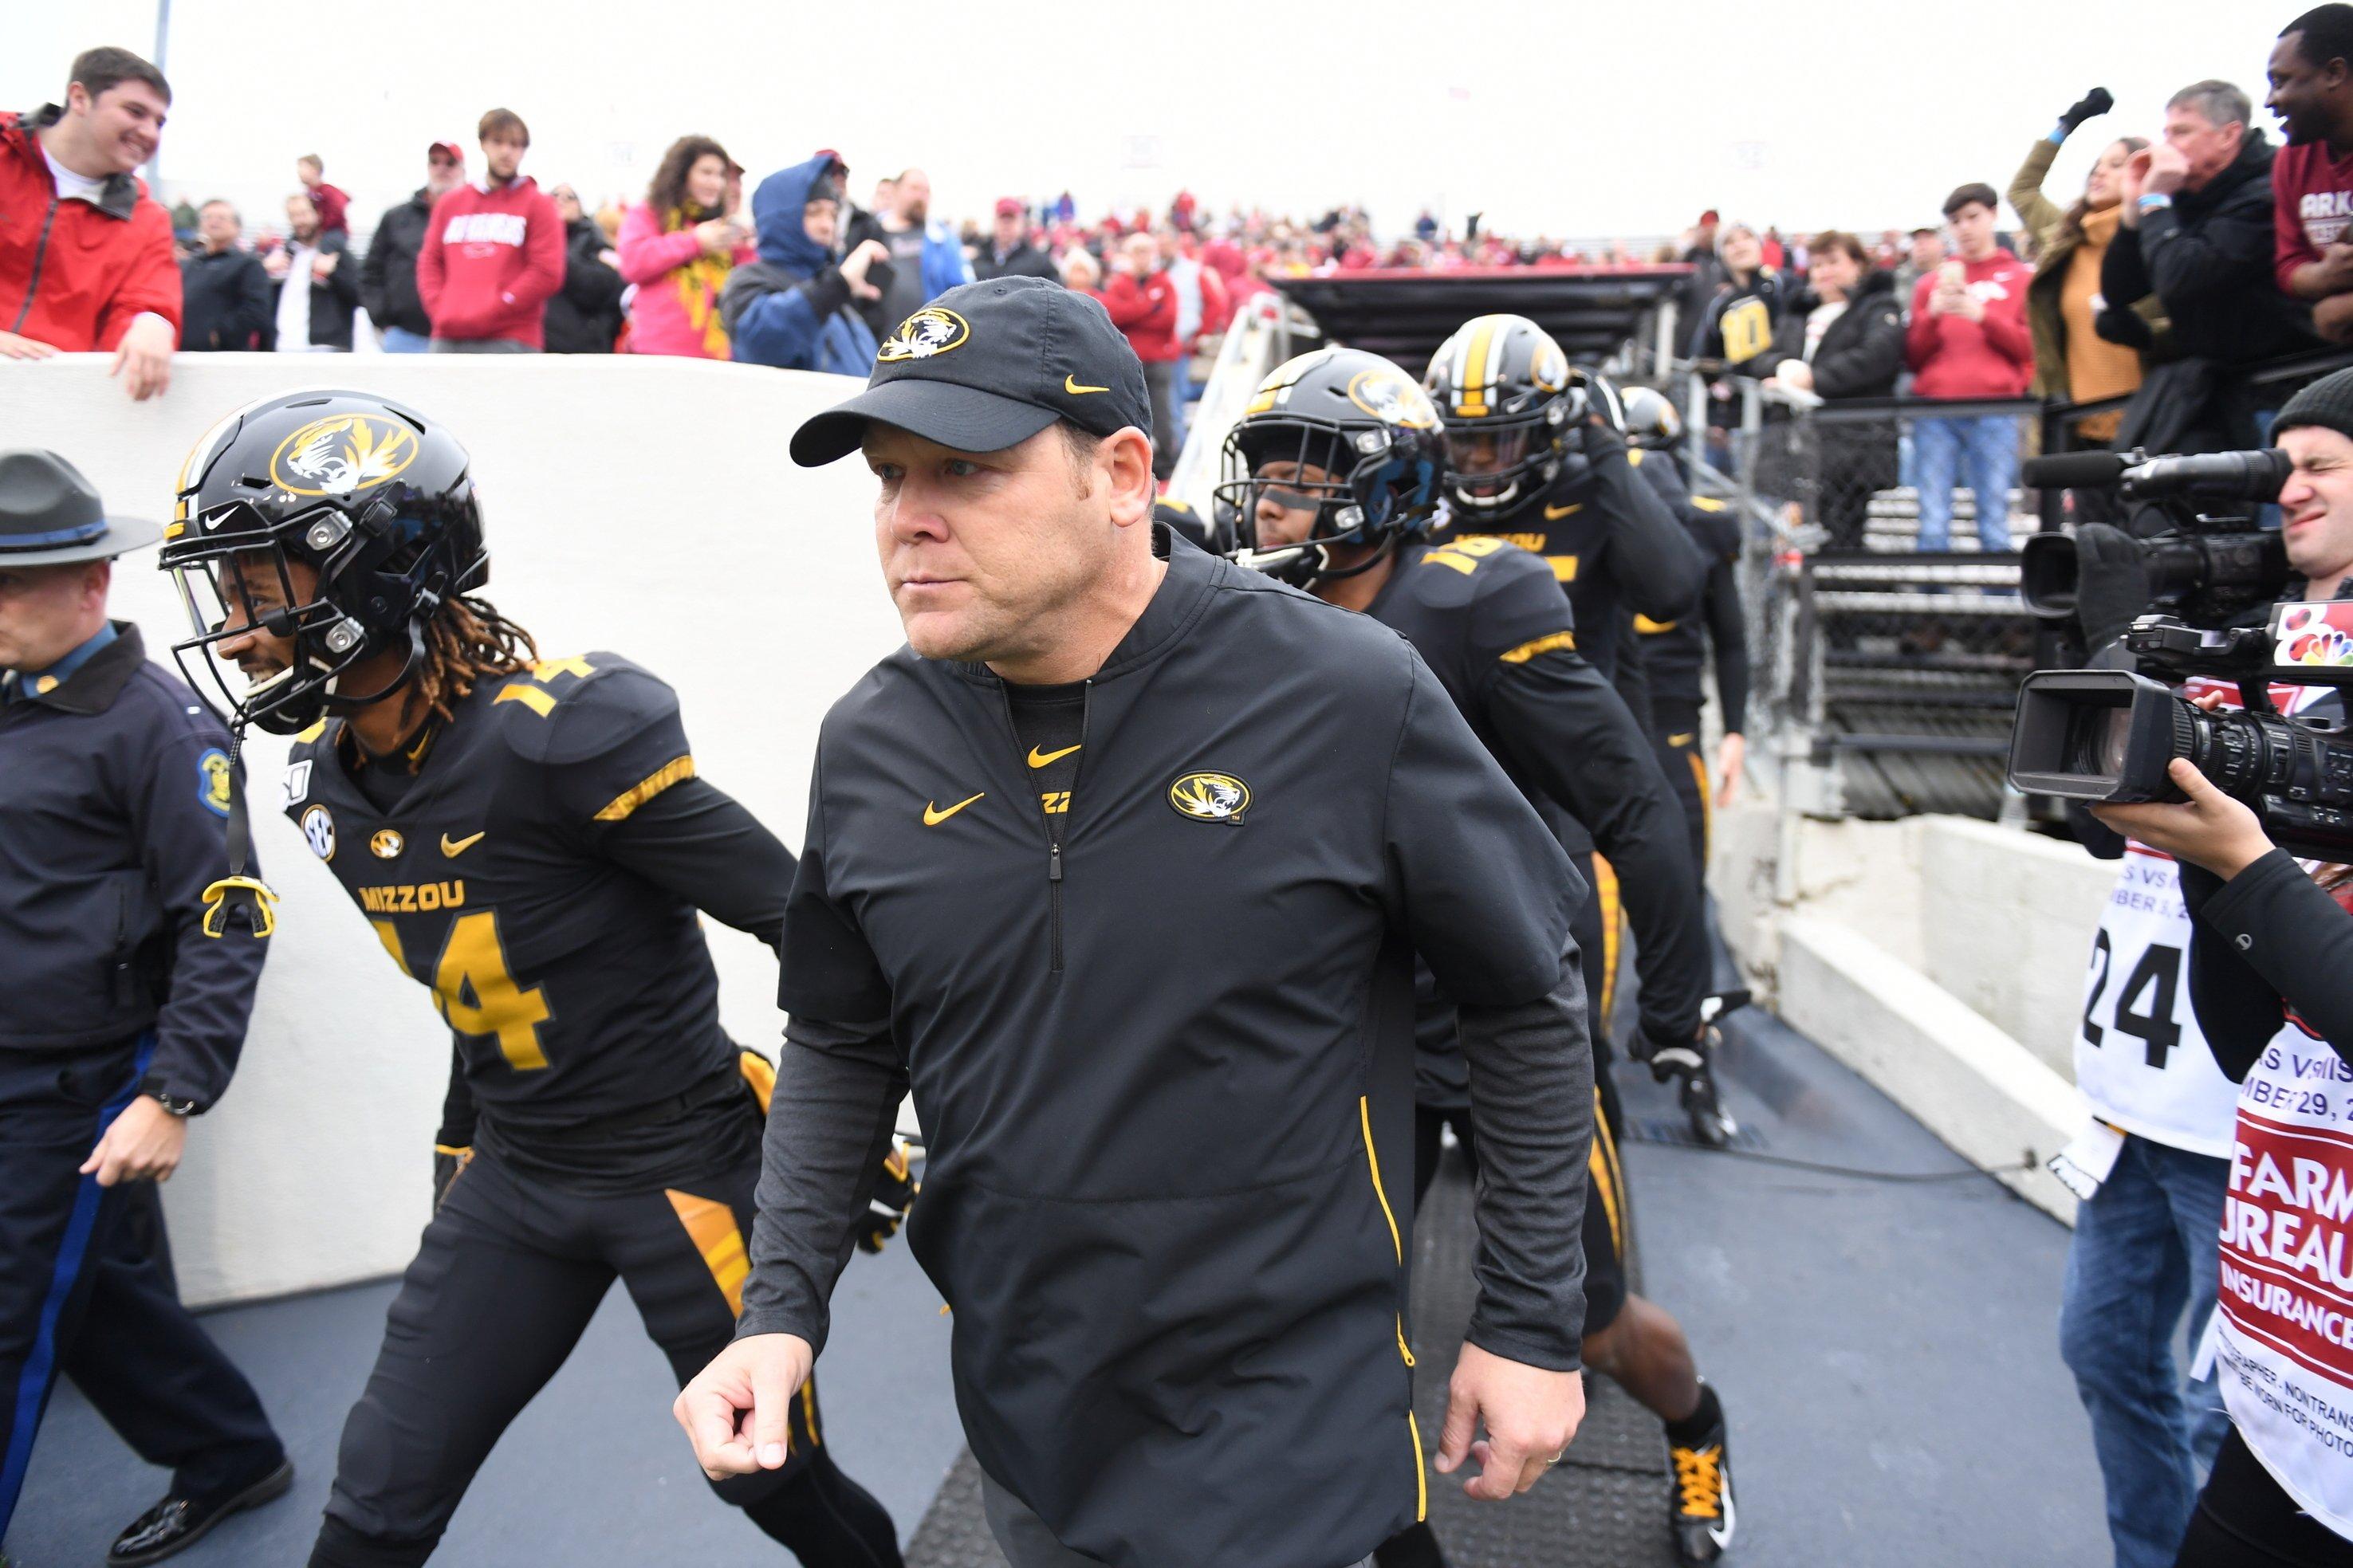 Missouri fires football coach Barry Odom after 4 seasons